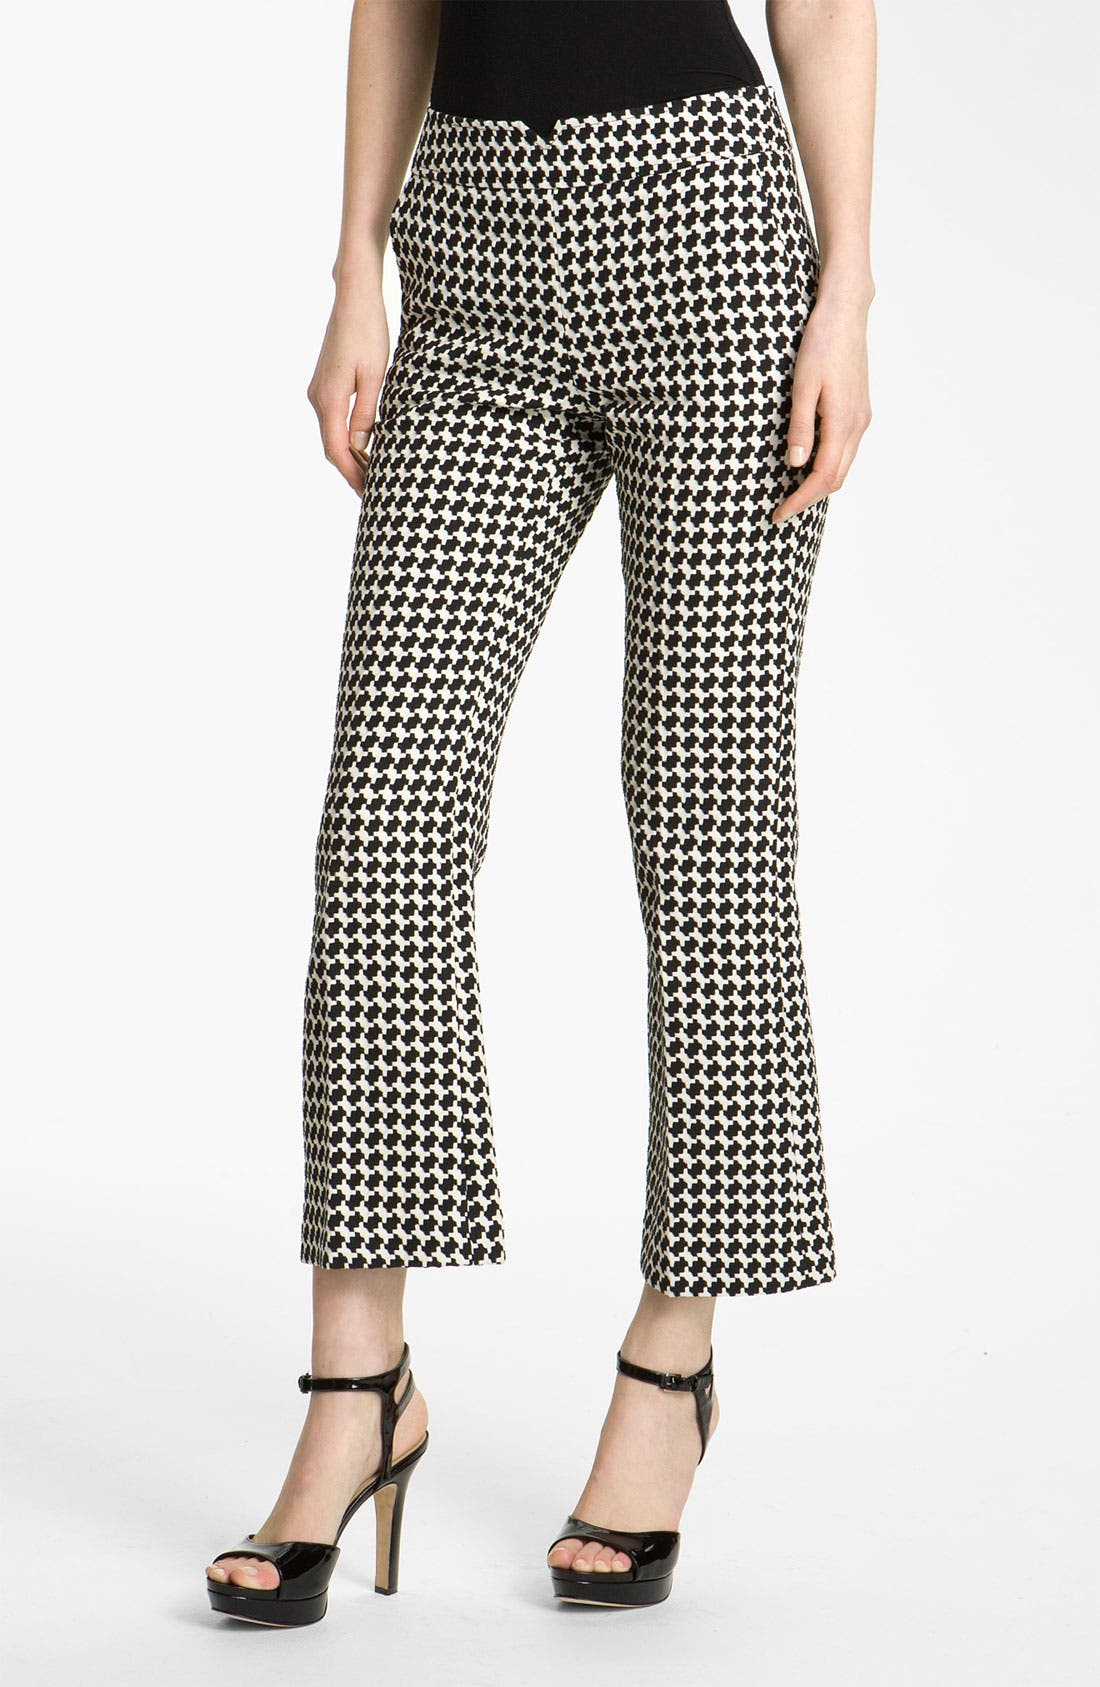 Main Image - Trina Turk 'Fez' Crop Pants